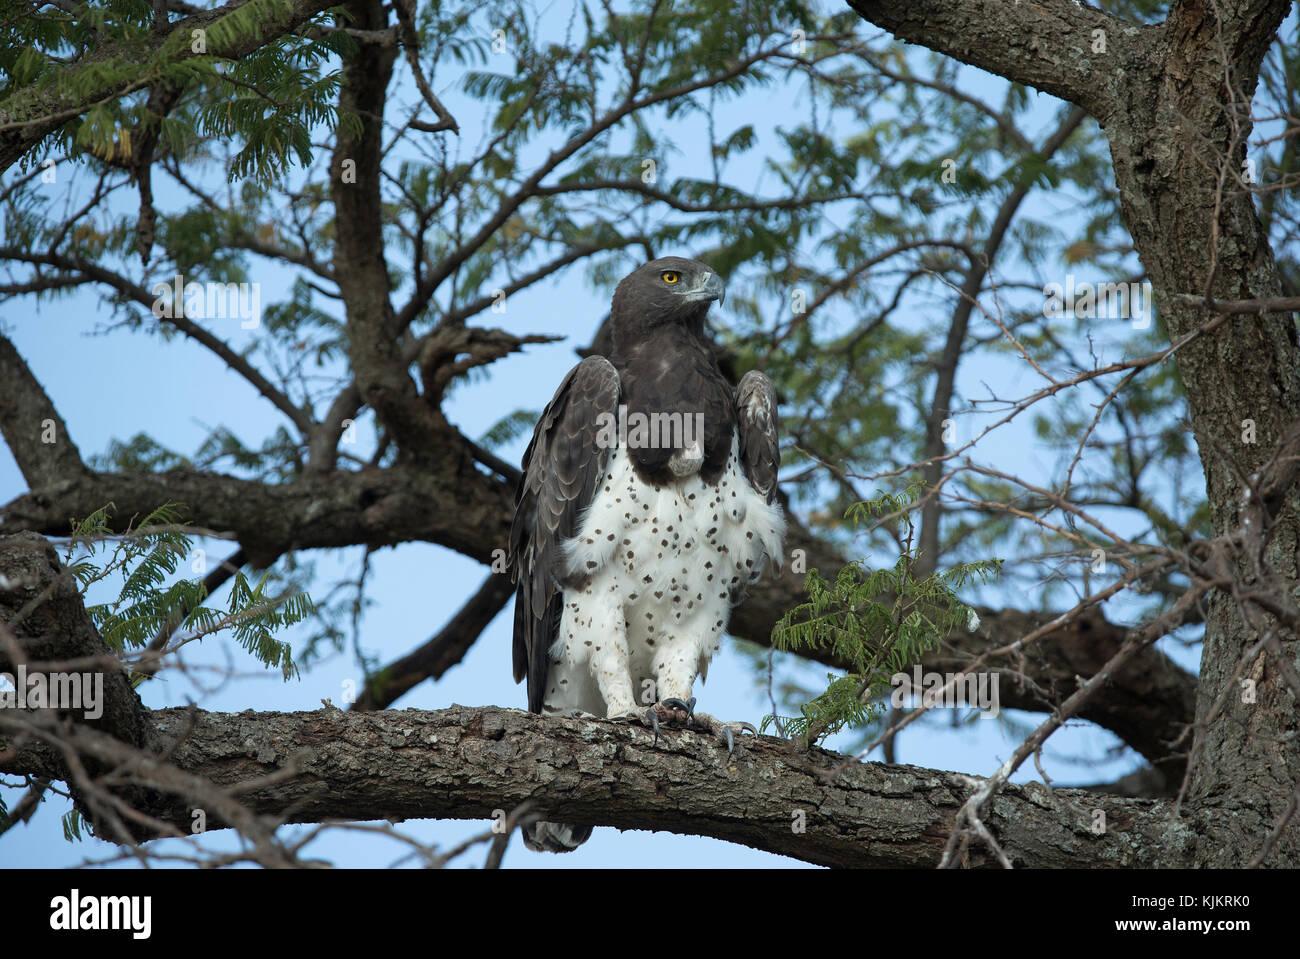 Serengeti National Park. Martial eagle, Polemaetus bellicosus, perching on a tree. Tanzania. - Stock Image